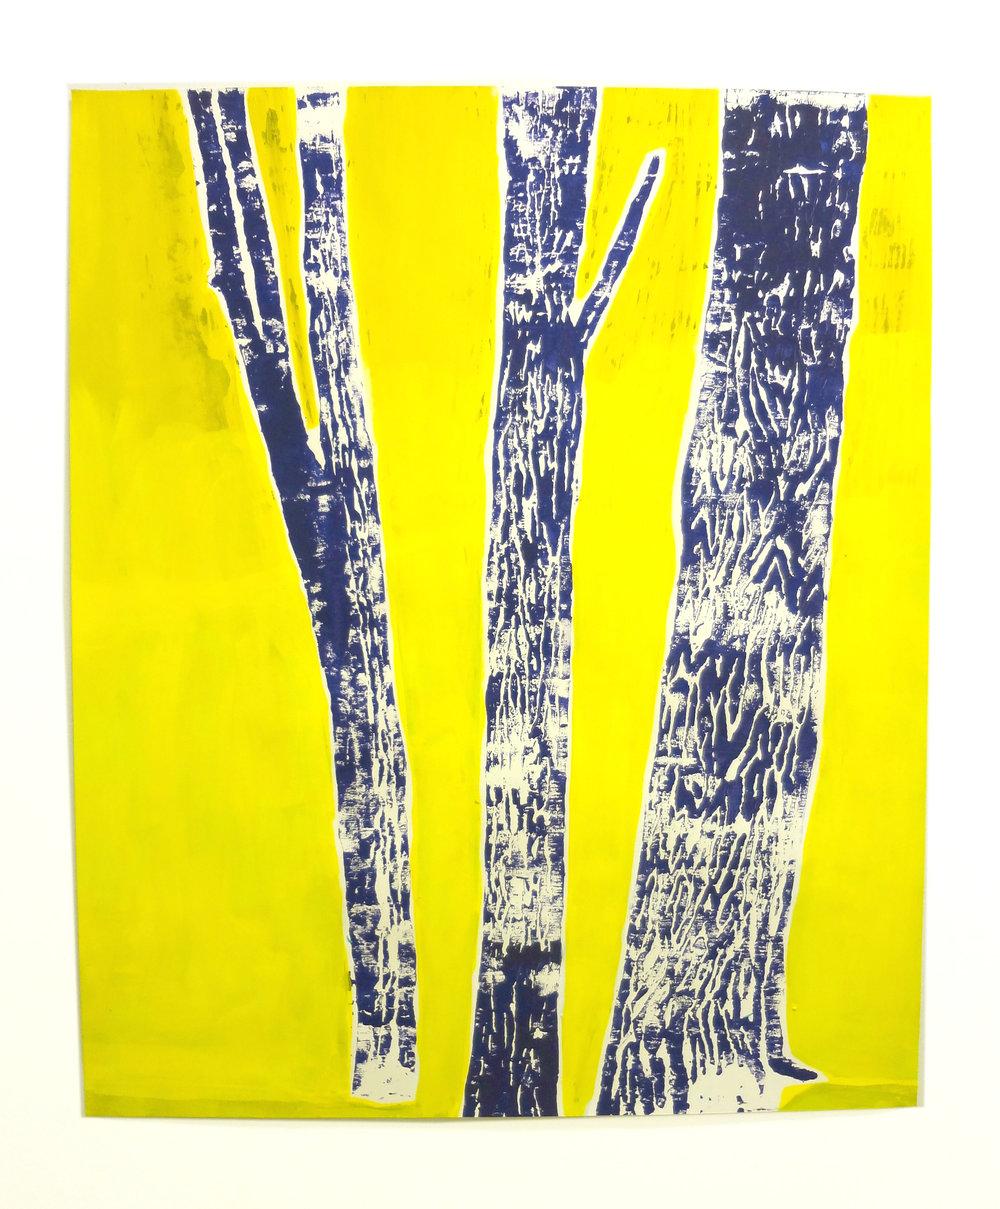 Meghan Gerety  Indigo on Yello Trees , 2012 blockprint ink on blockprint paper 34 x 30 in.